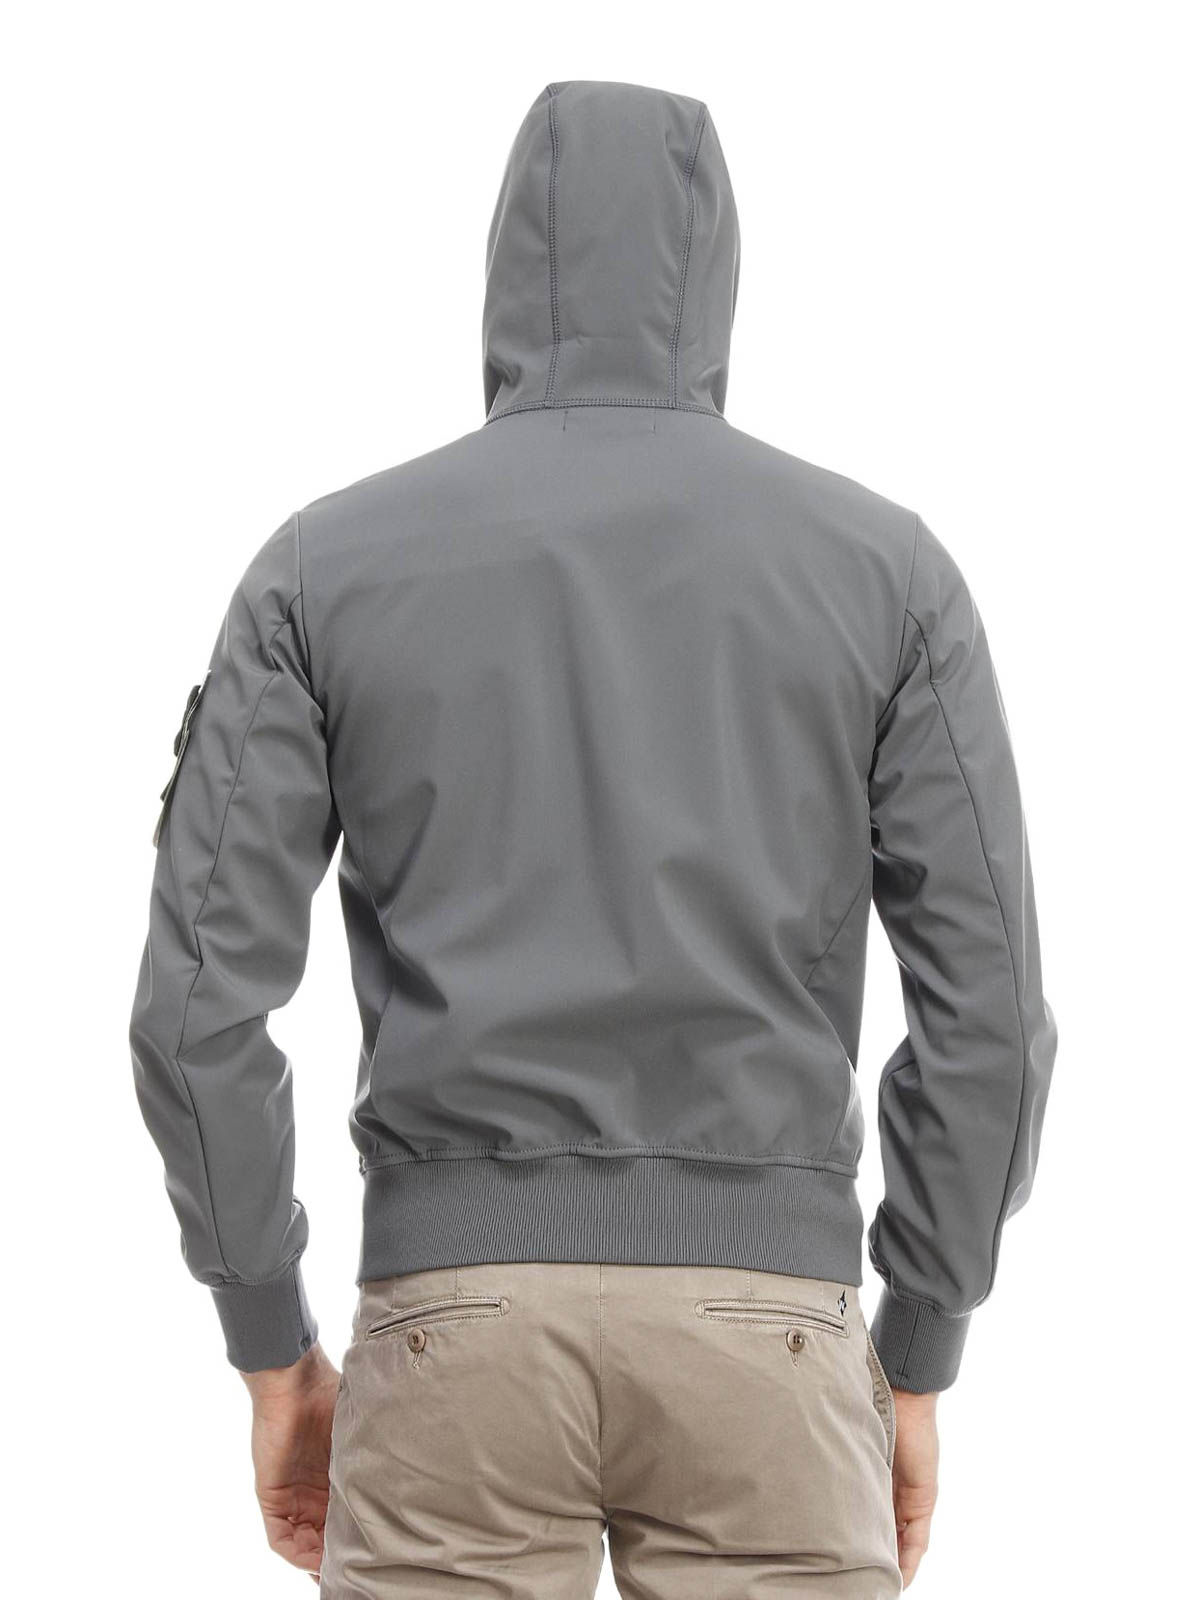 Light Soft Shell jacket by Stone Island - casual jackets - iKRIX